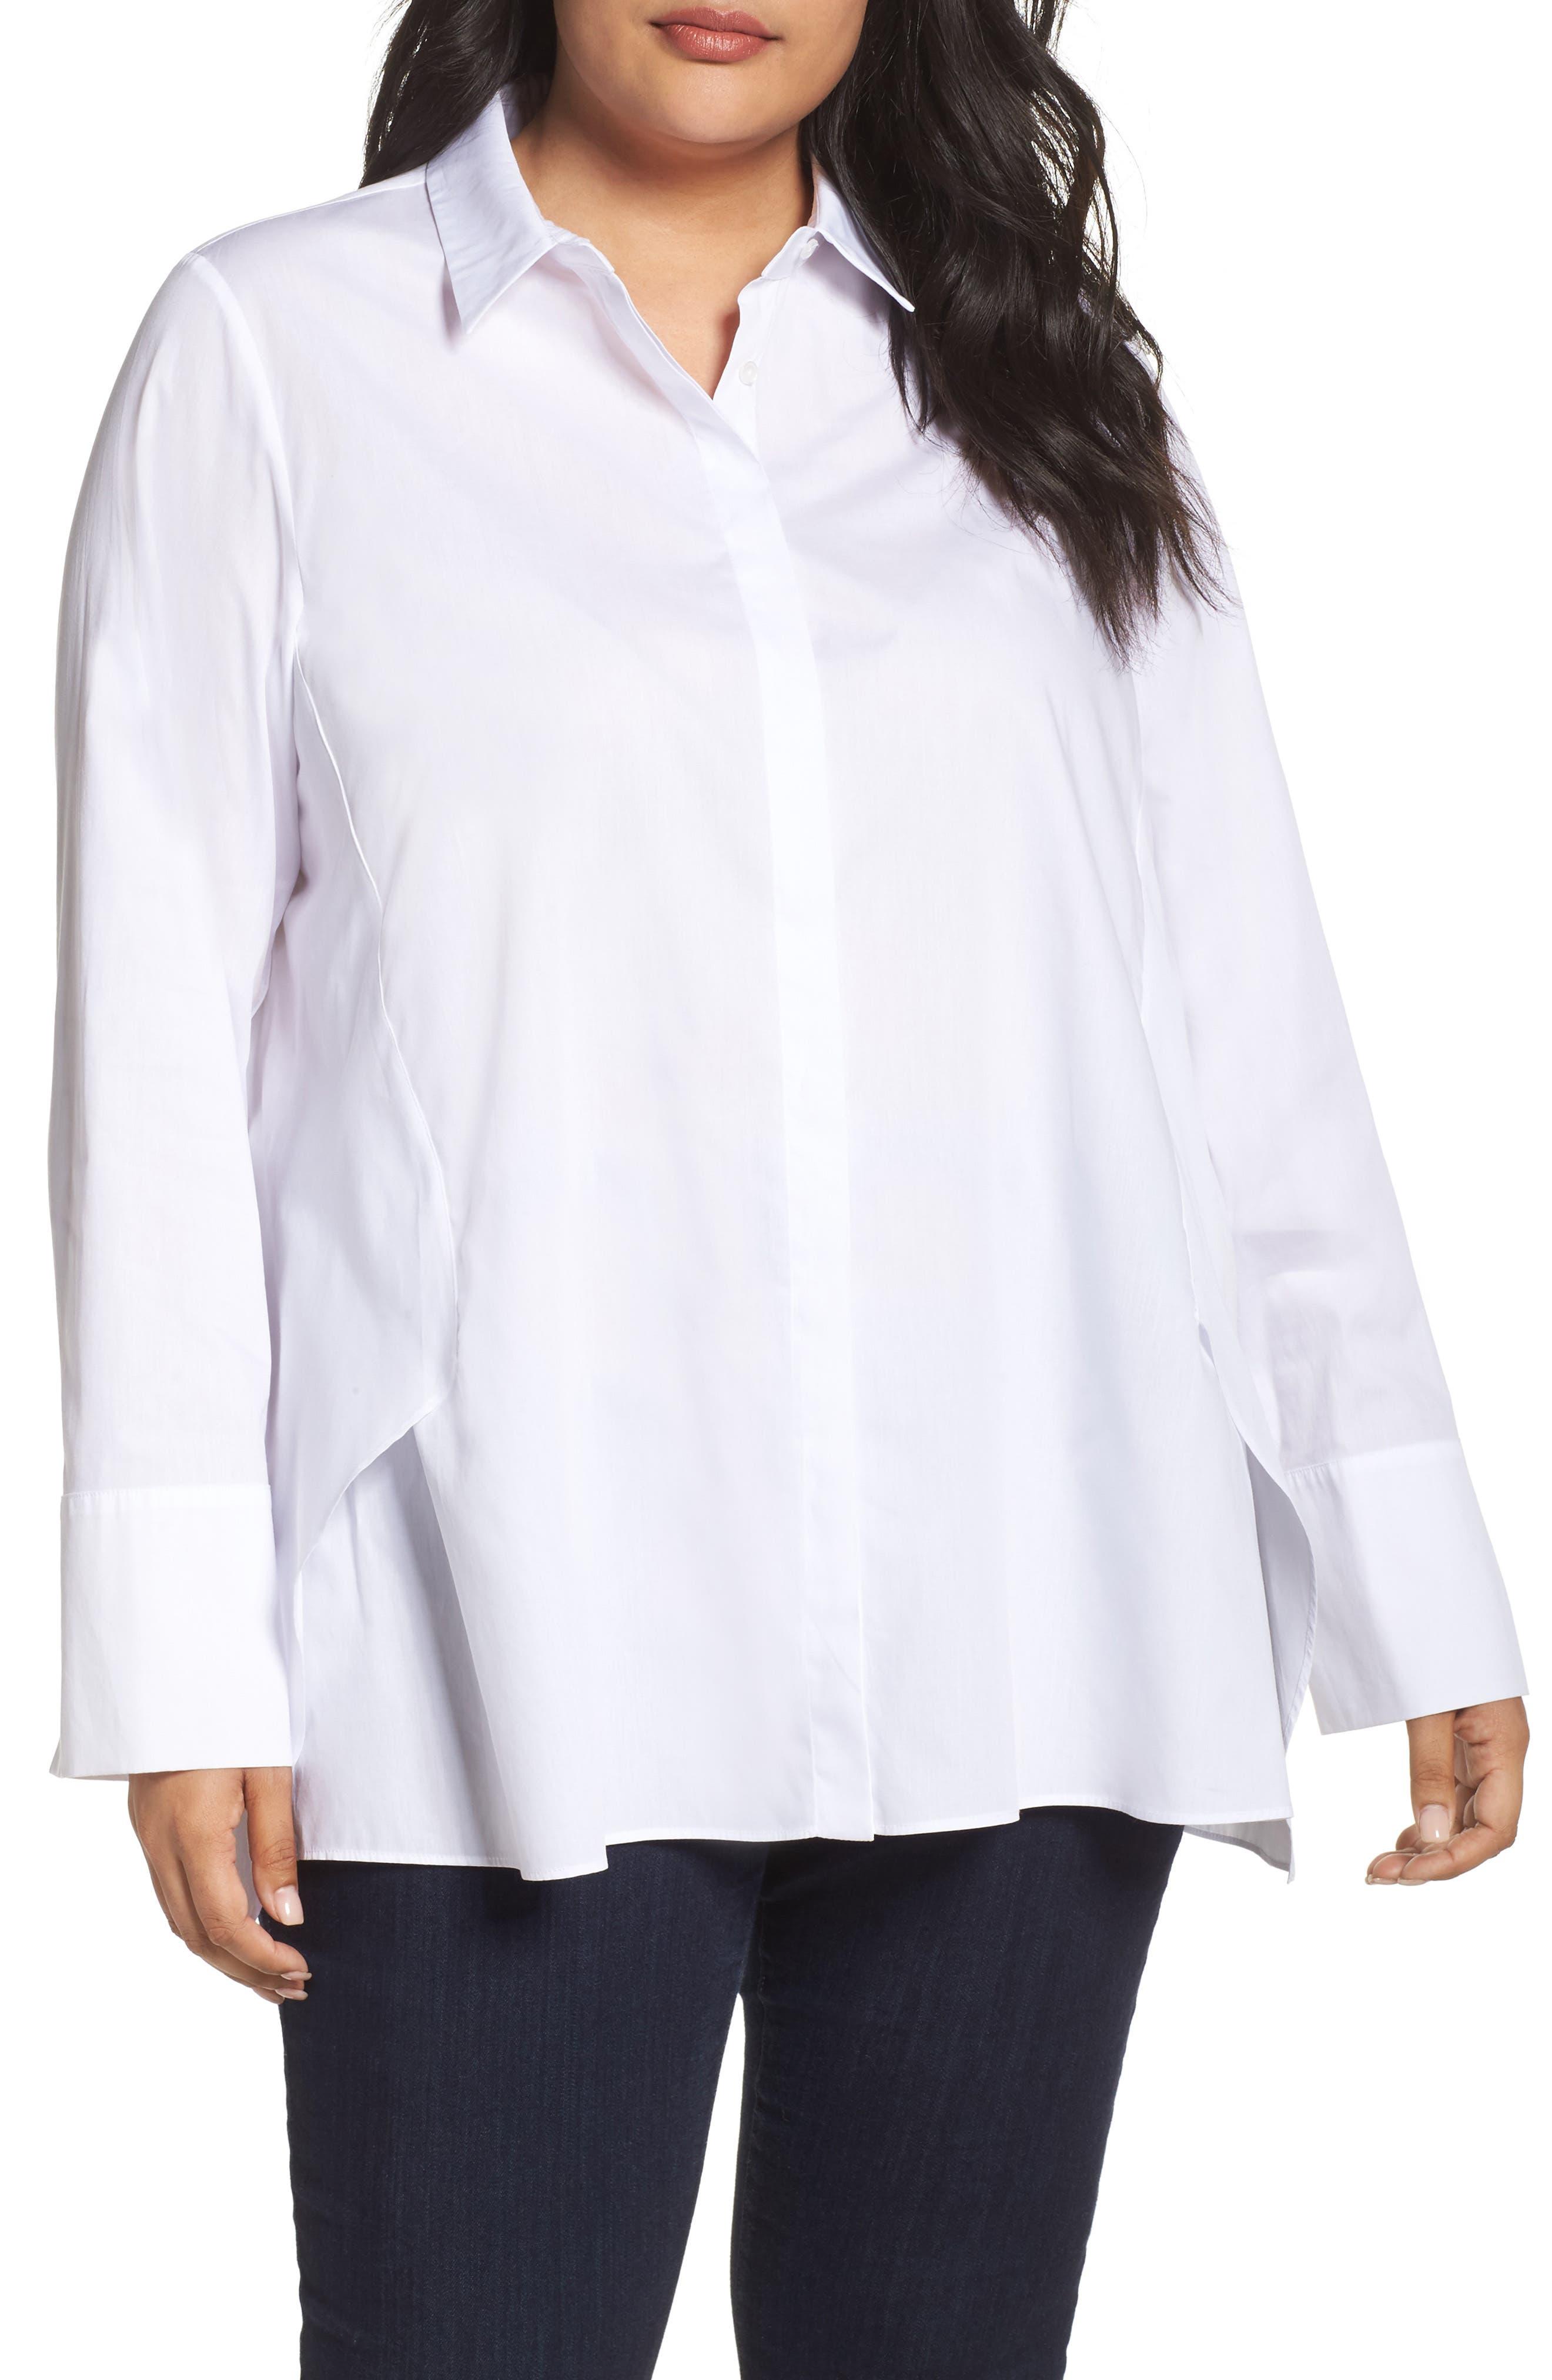 Fato Shirt,                             Main thumbnail 1, color,                             White